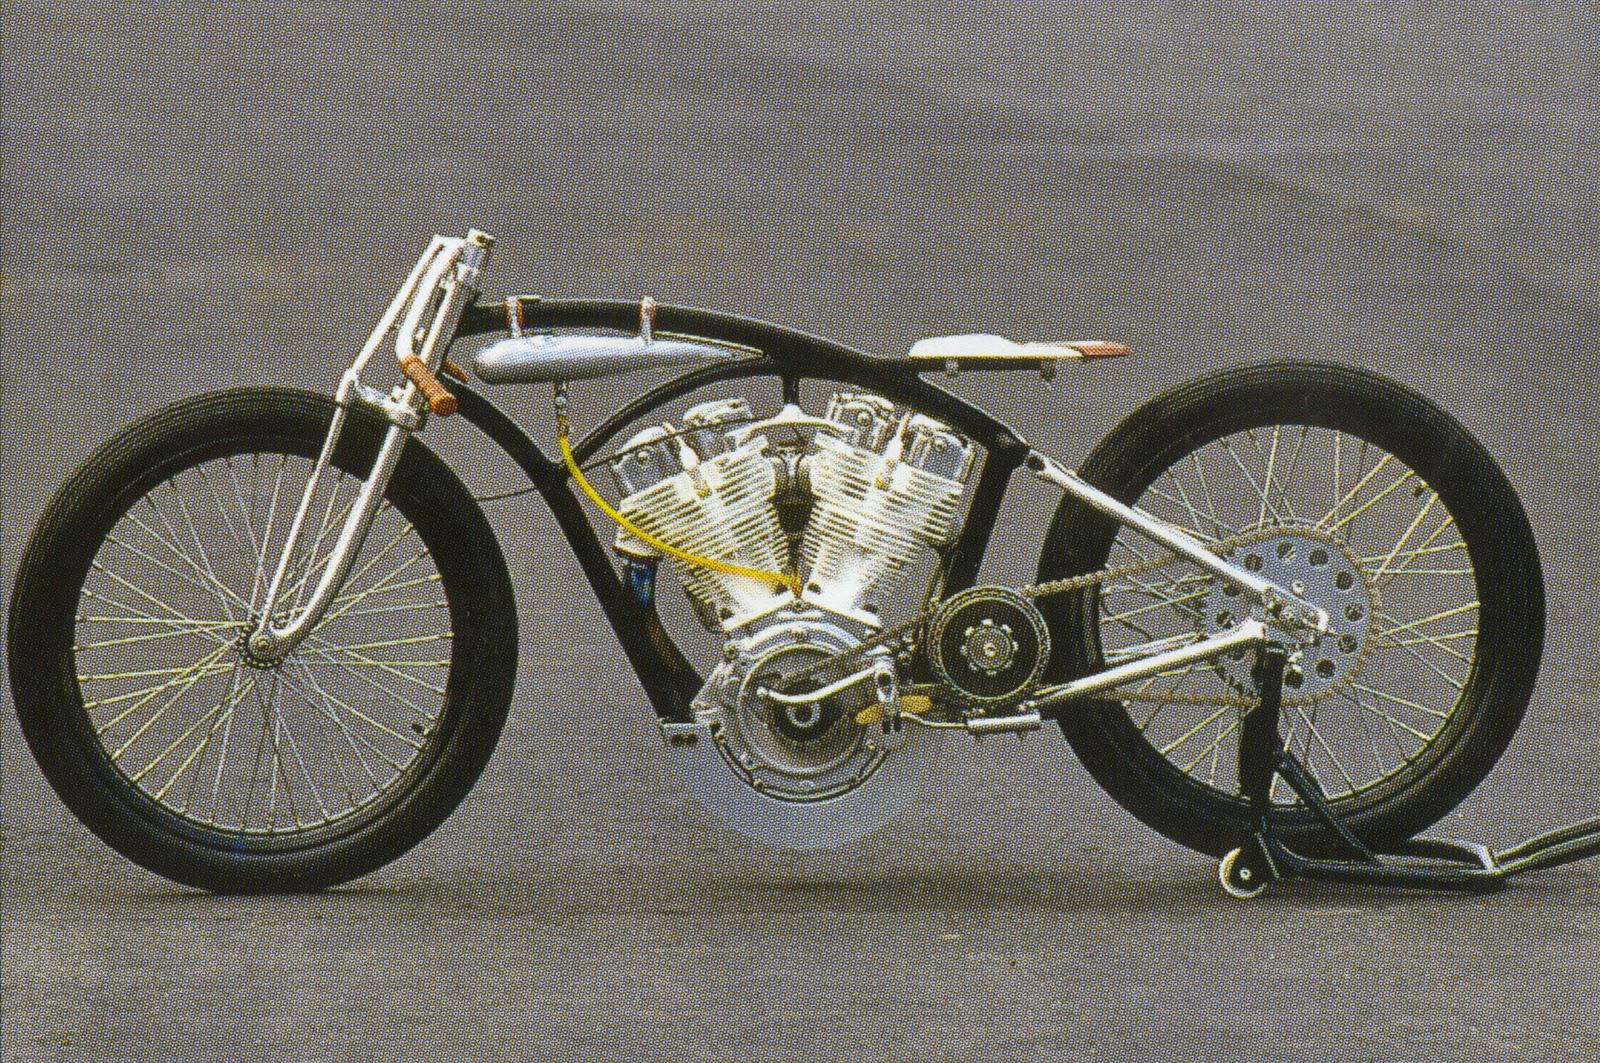 veetess plus belle moto du monde. Black Bedroom Furniture Sets. Home Design Ideas